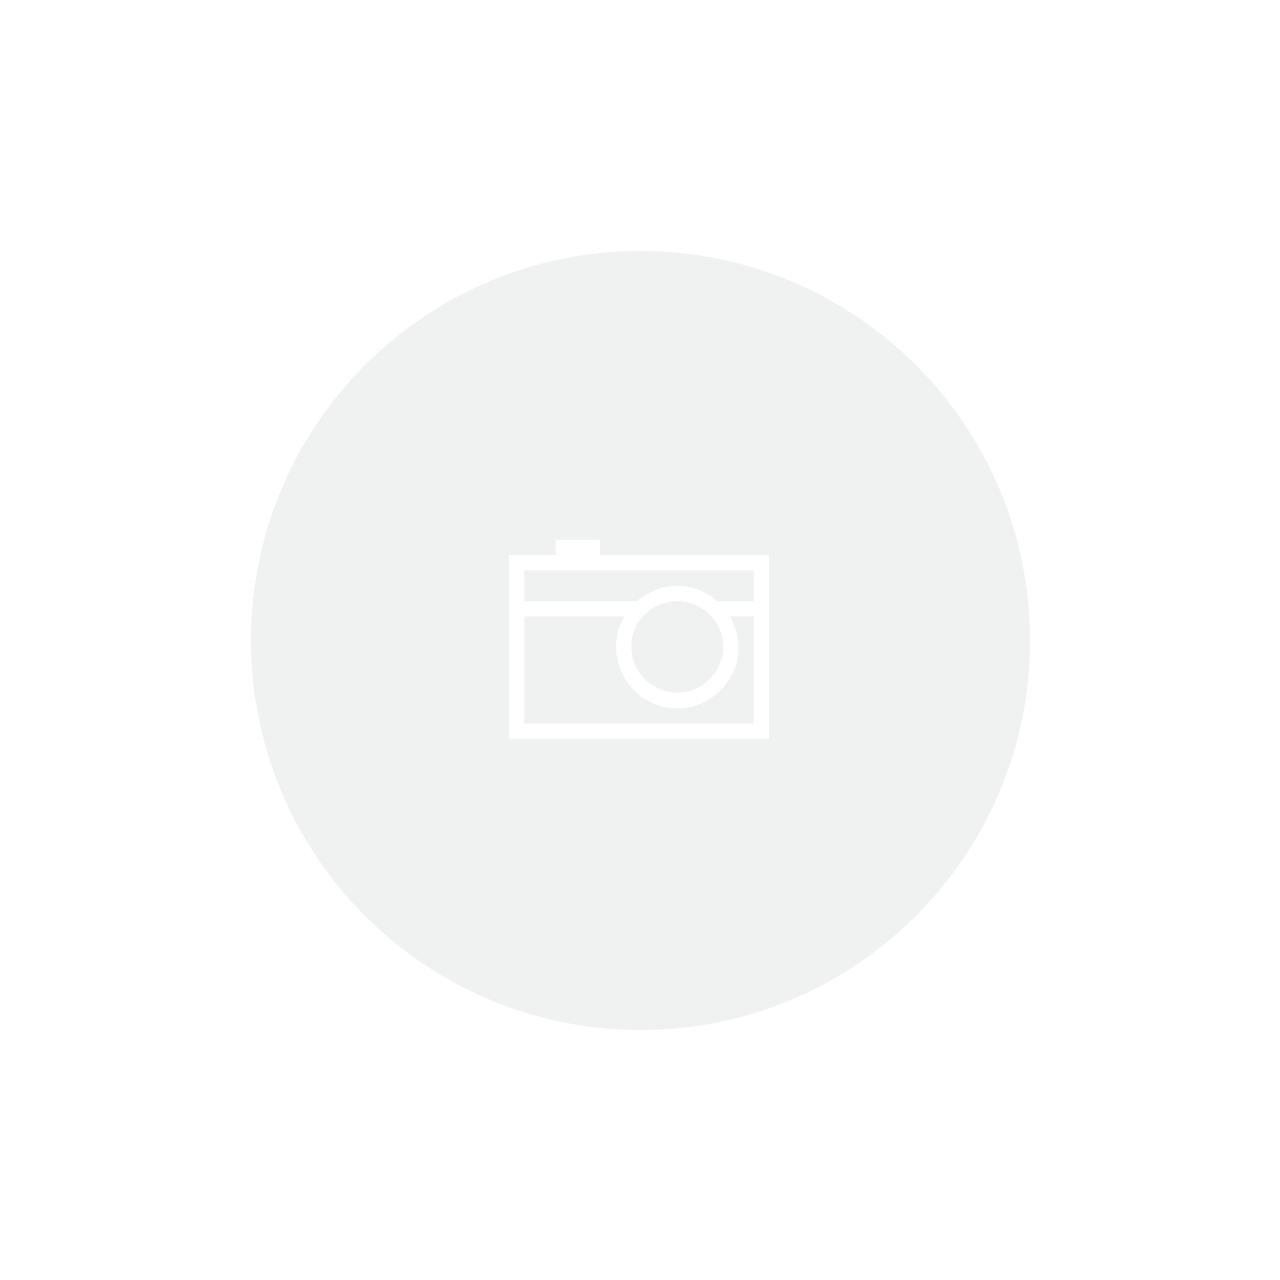 GRUPO 12V SRAM X01 ENDURO EAGLE AXS C/ DUB 175mm BOOST (32D)